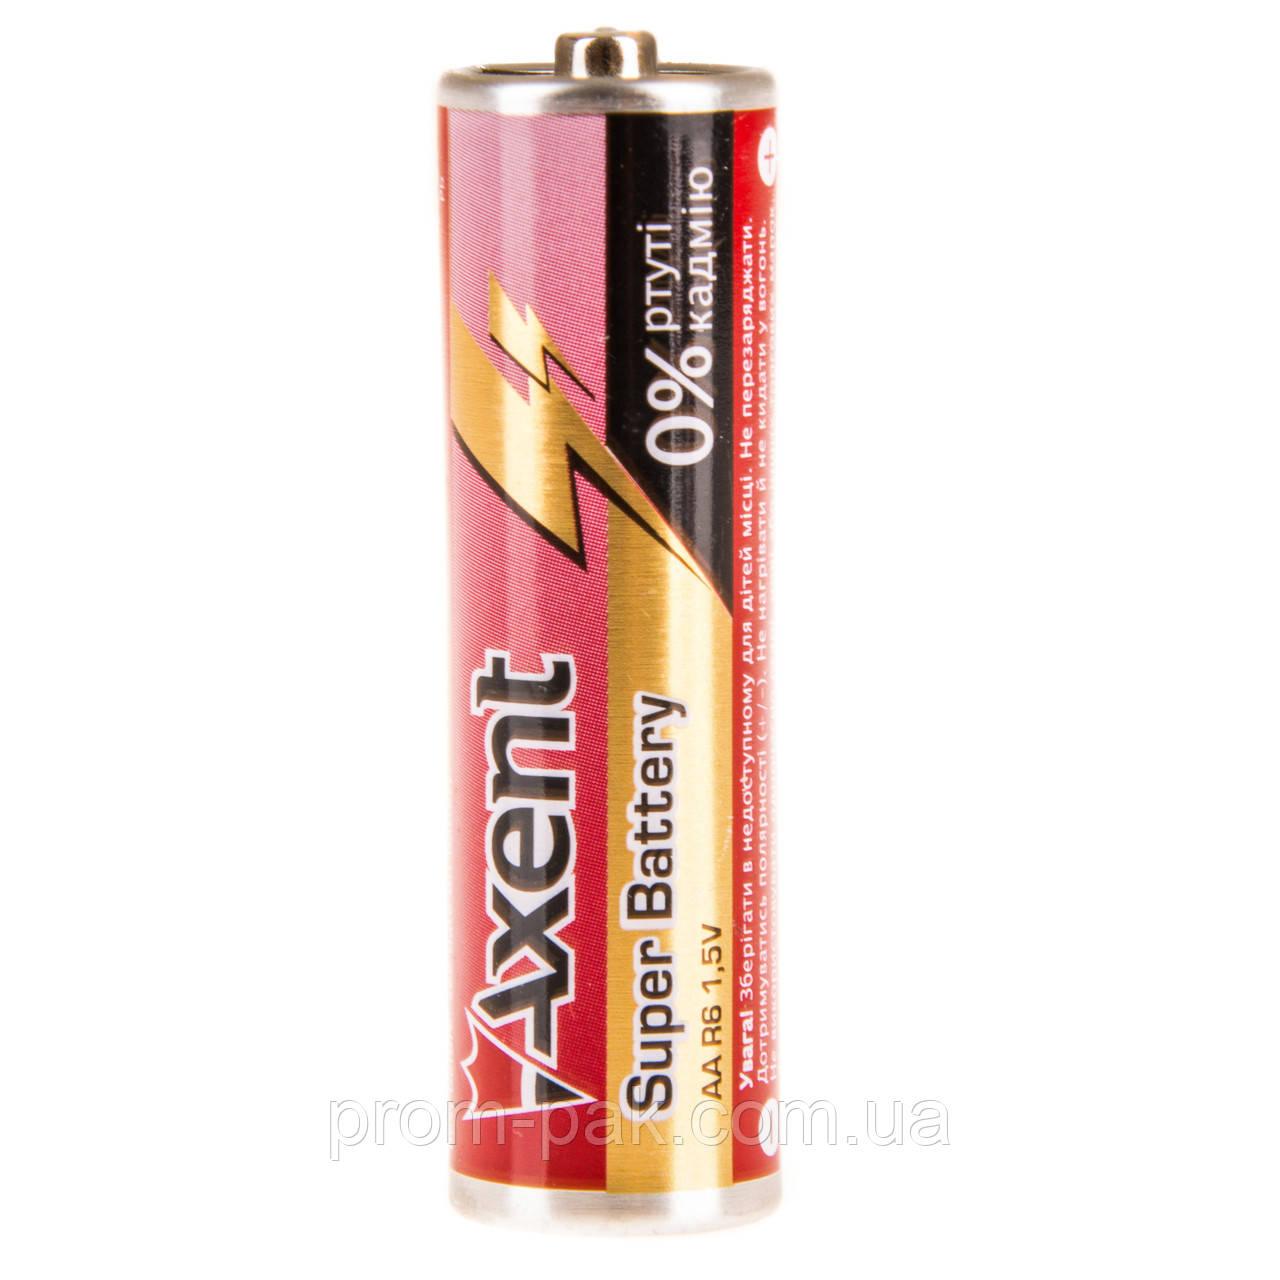 Пальчиковые батарейки Axent R6 AA 1.5V 5556-1